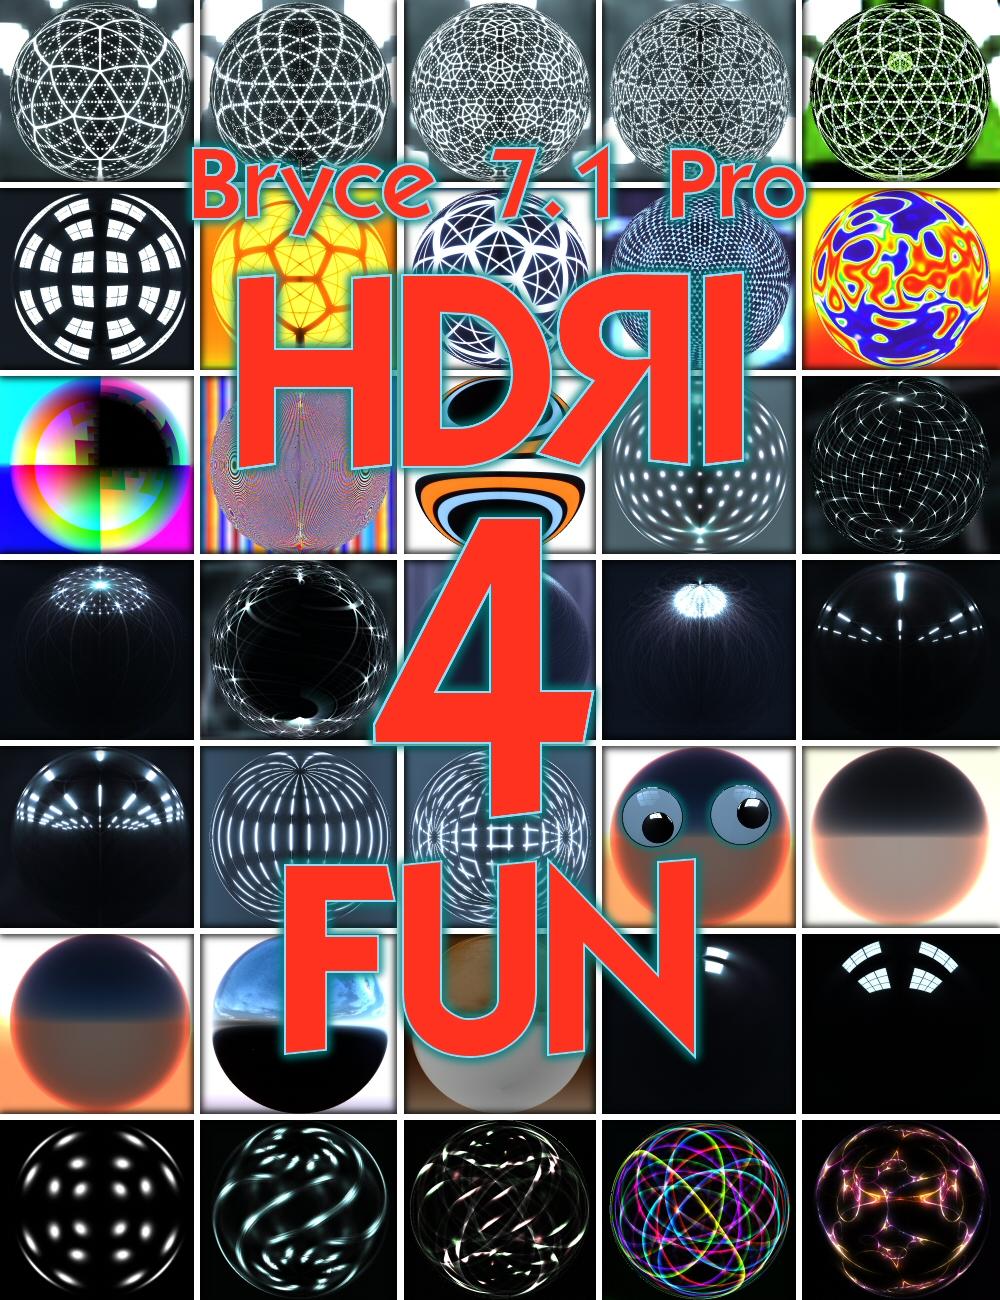 Bryce 7.1 Pro - HDRI for Fun by: David BrinnenHoro, 3D Models by Daz 3D